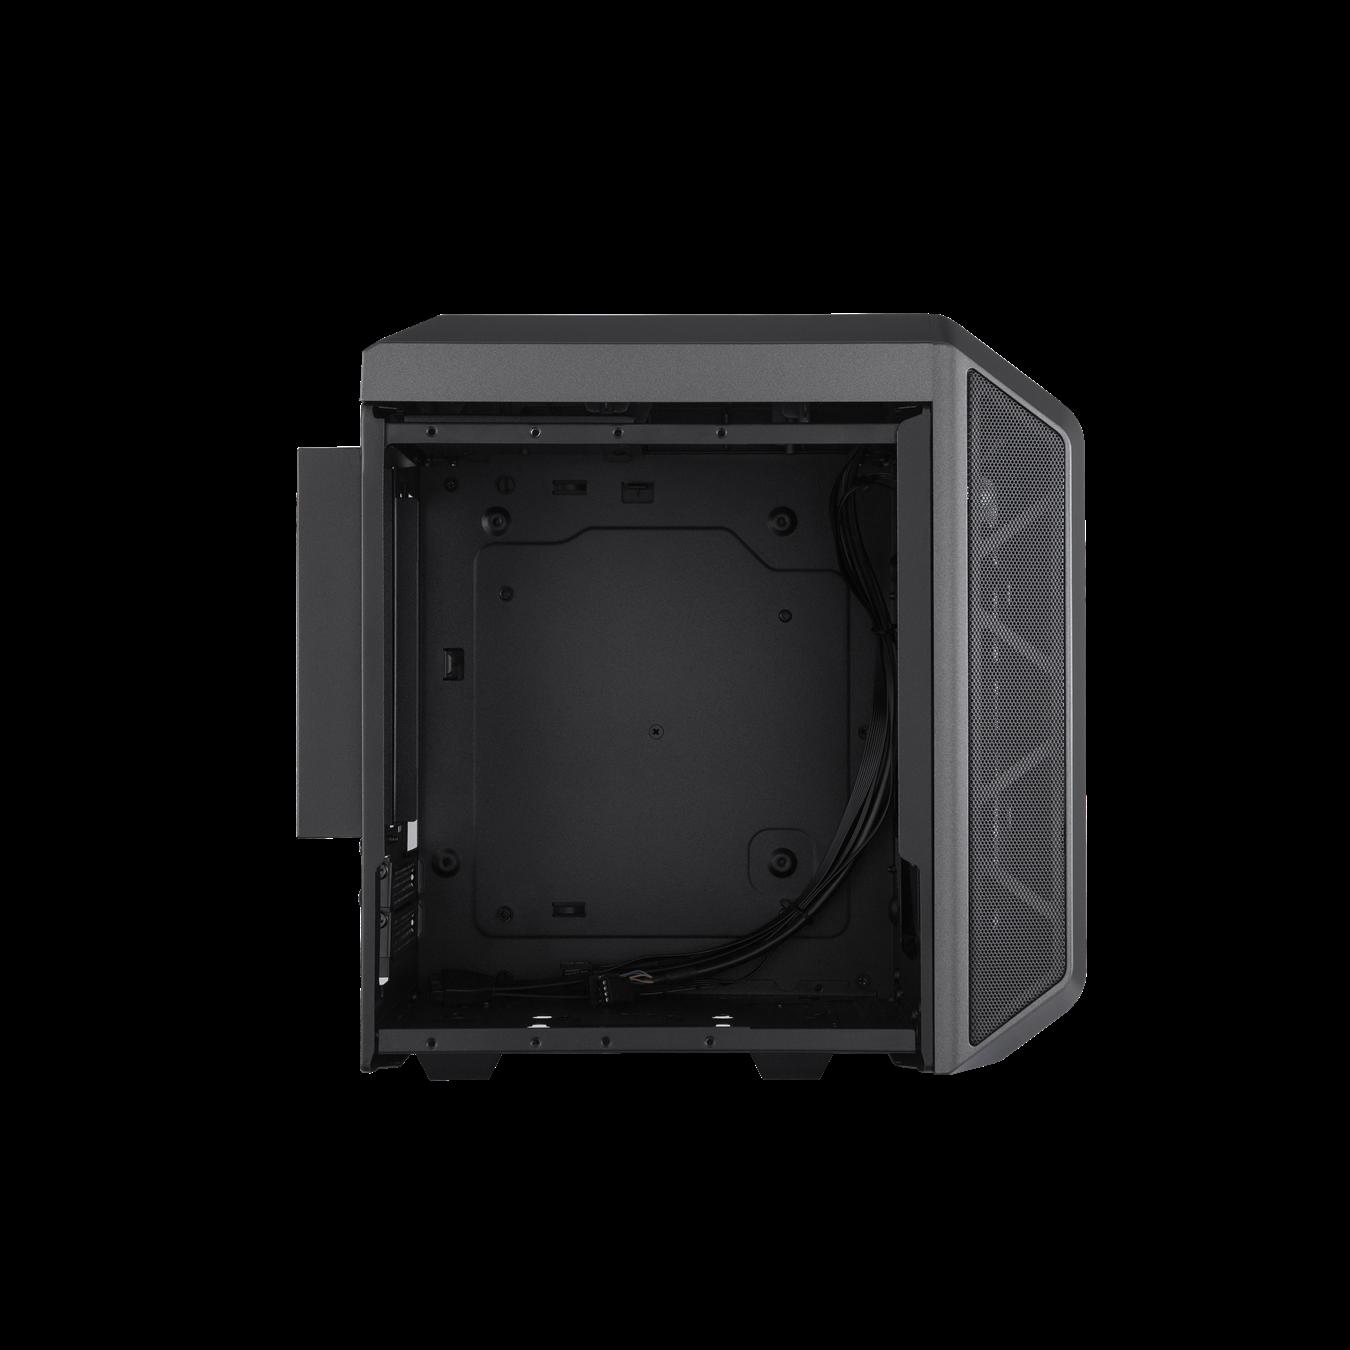 Case CoolerMaster MASTERCASE H100